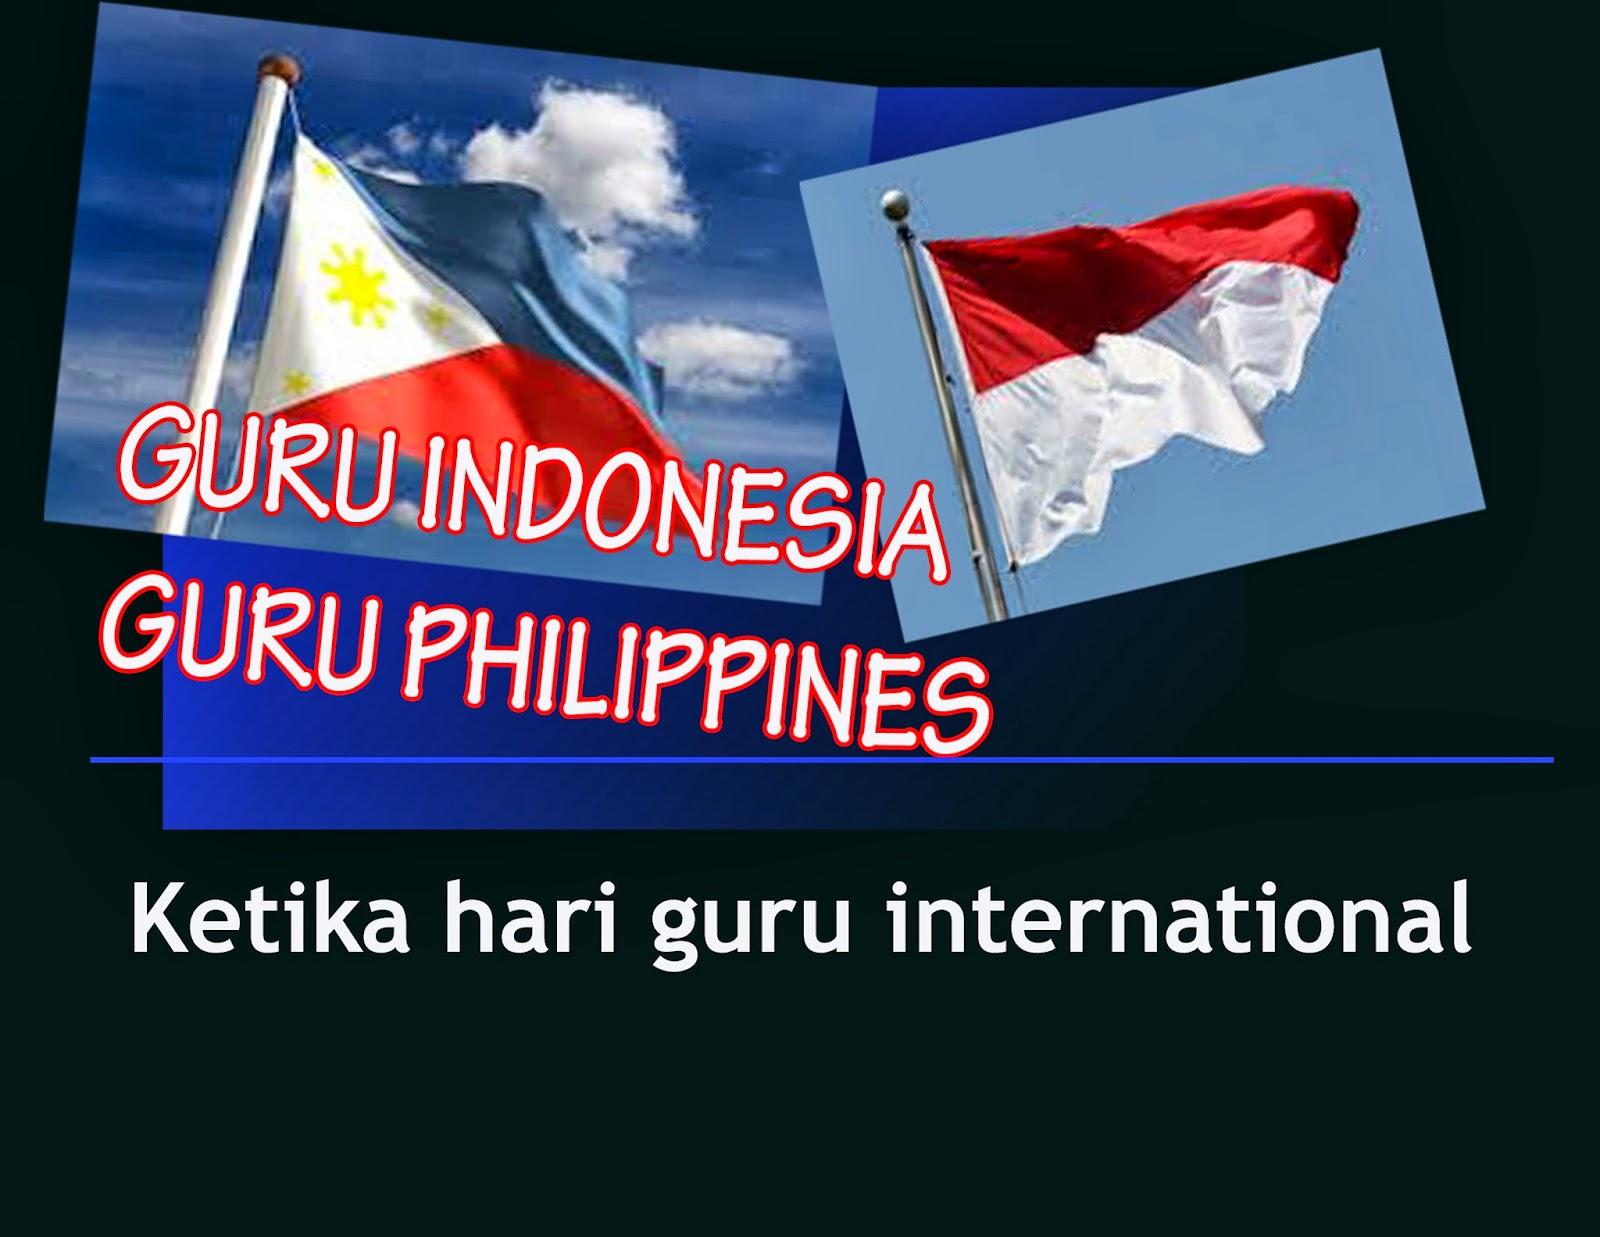 kafe Guru GURU INDONESIA MENYIKAPI HARI GURU INTERNATIONAL